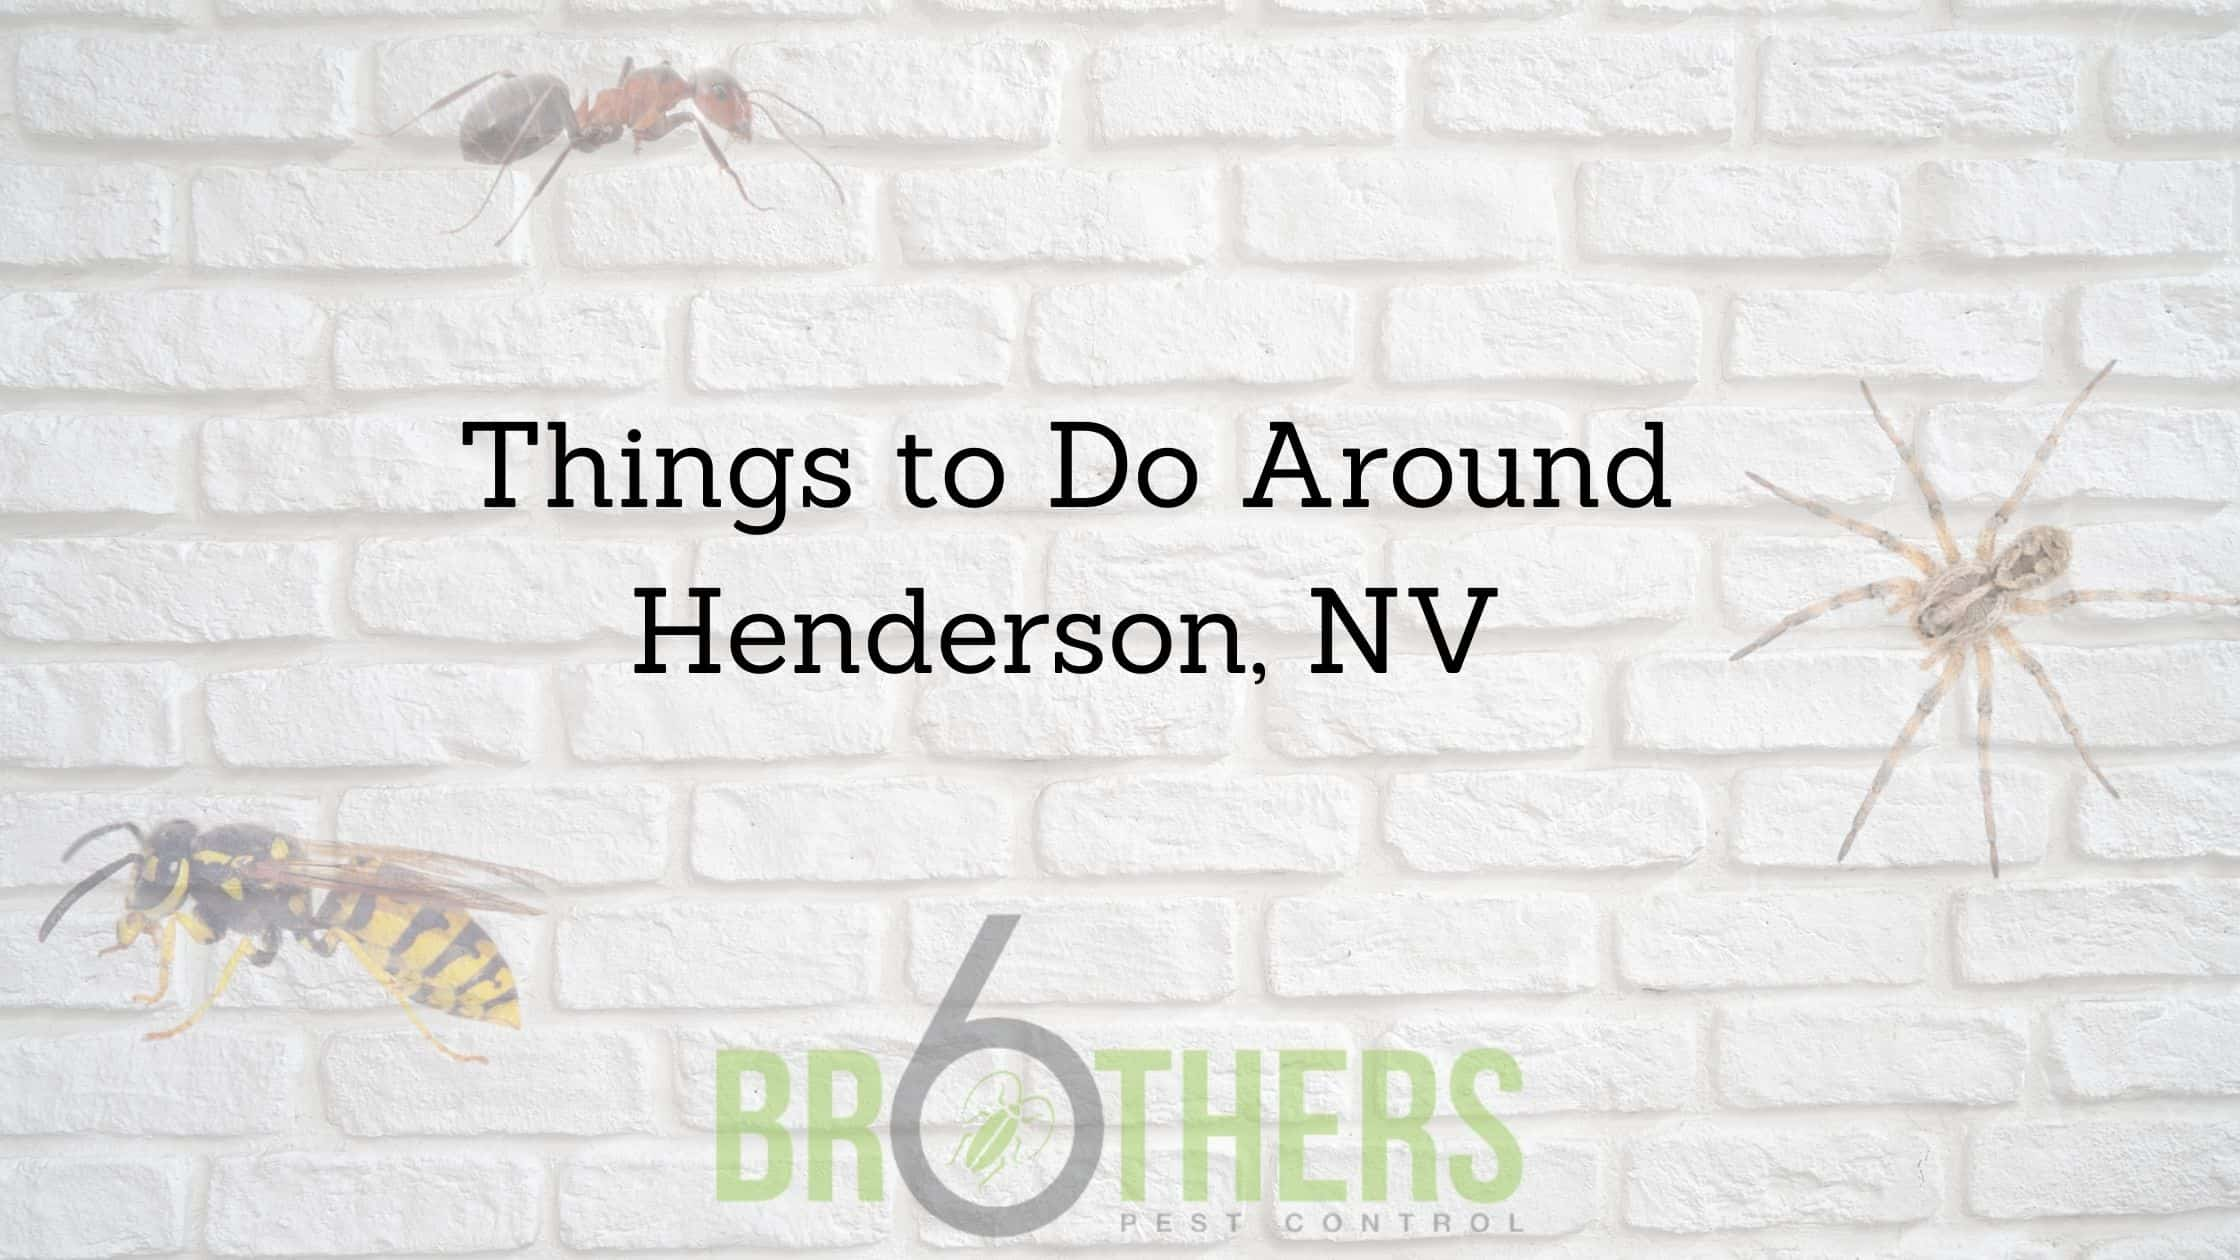 Things to Do Around Henderson, NV